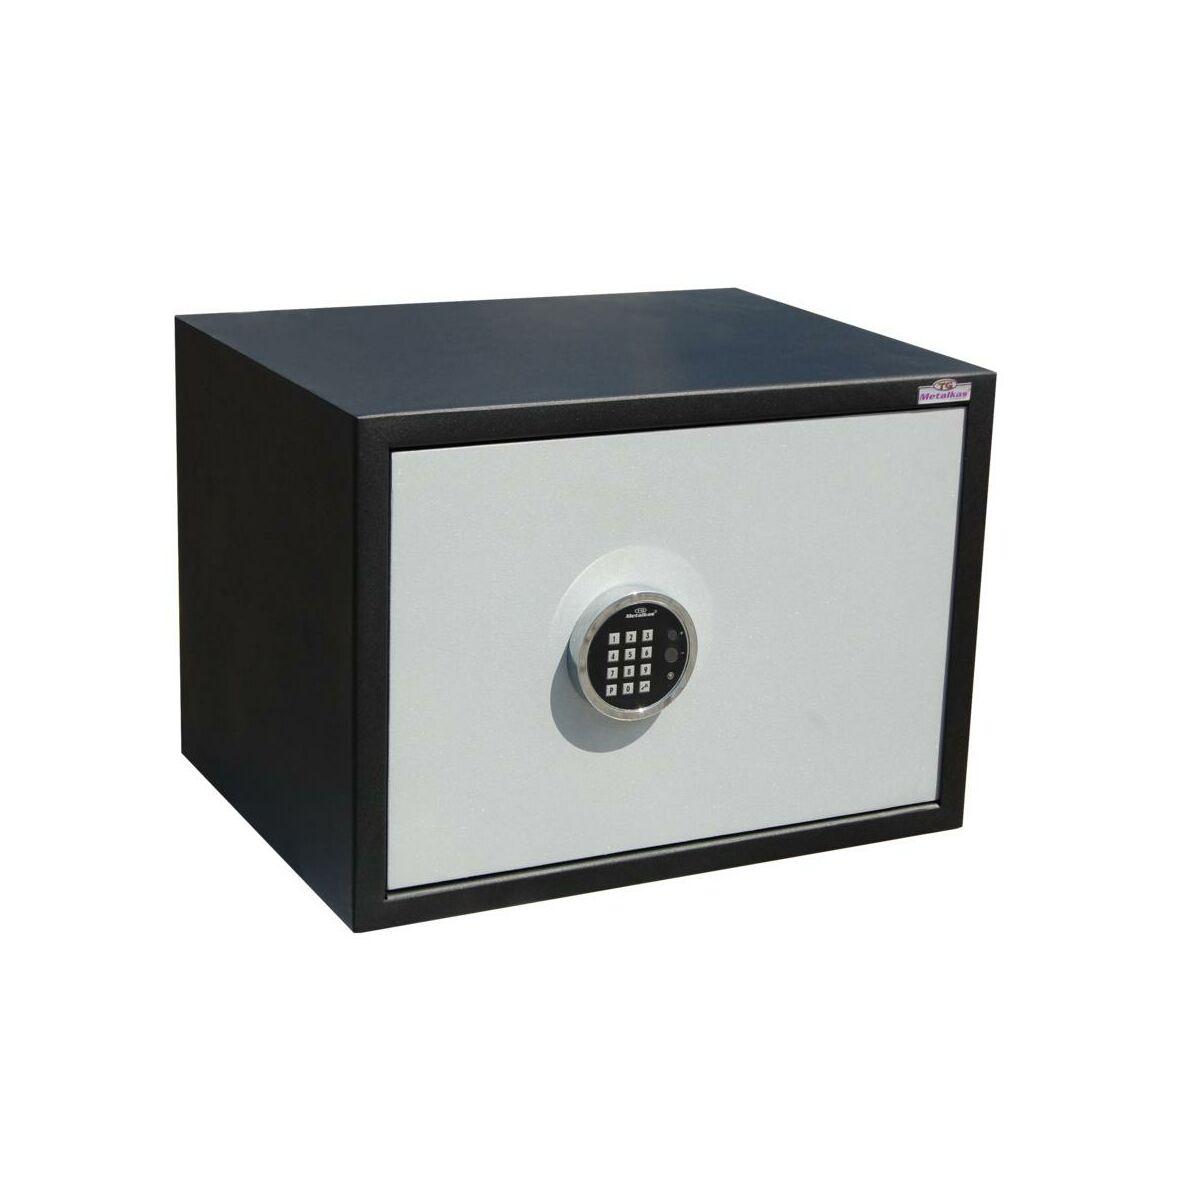 sejf tg 3sho k9005 mrozik metalkas sejfy w atrakcyjnej. Black Bedroom Furniture Sets. Home Design Ideas